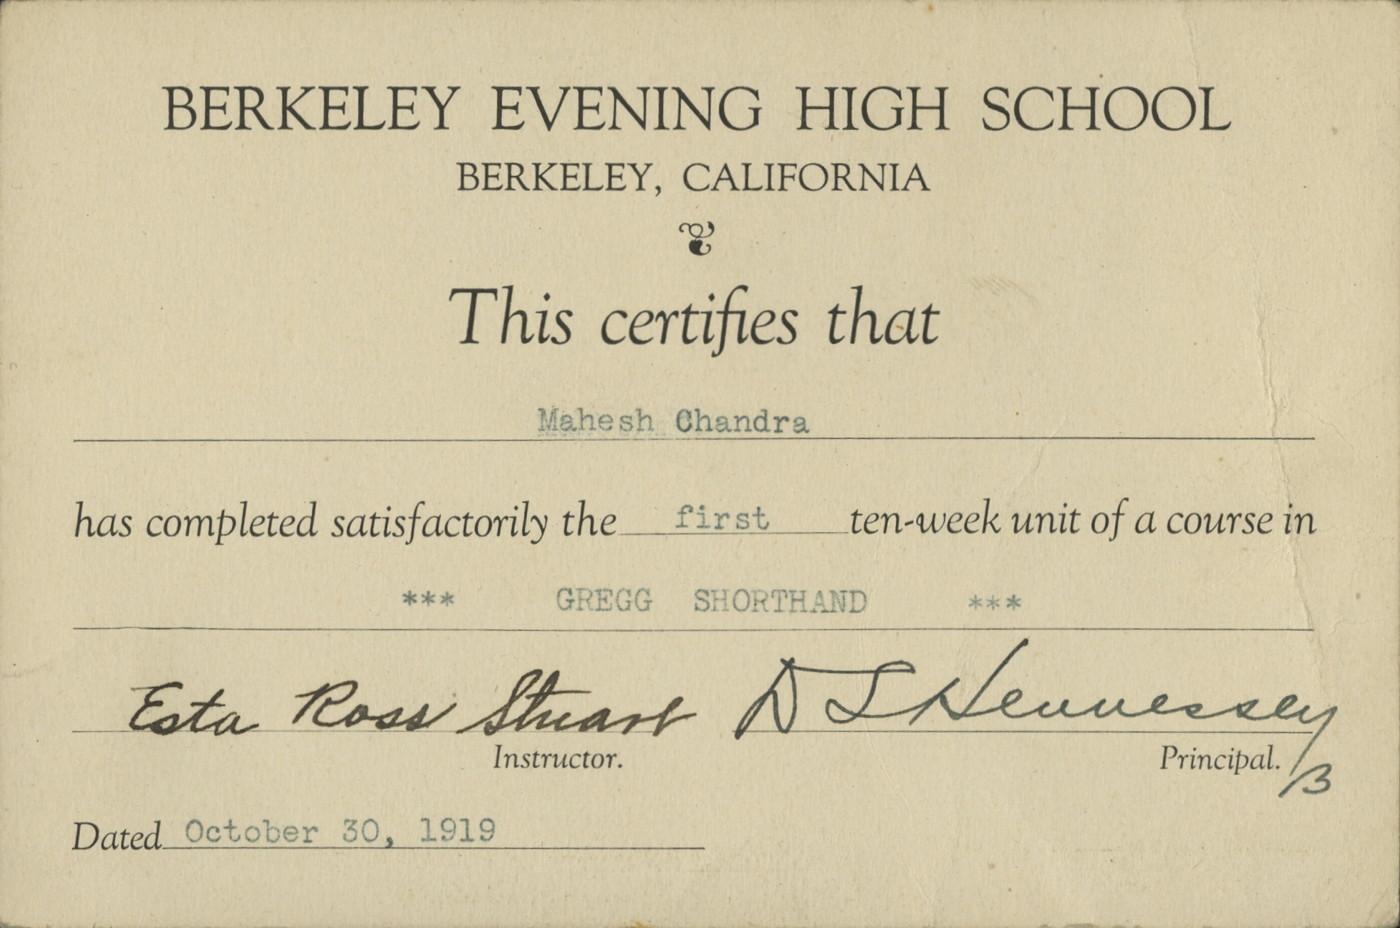 Berkeley Evening High School Certificate for Mahesh Chandra ...